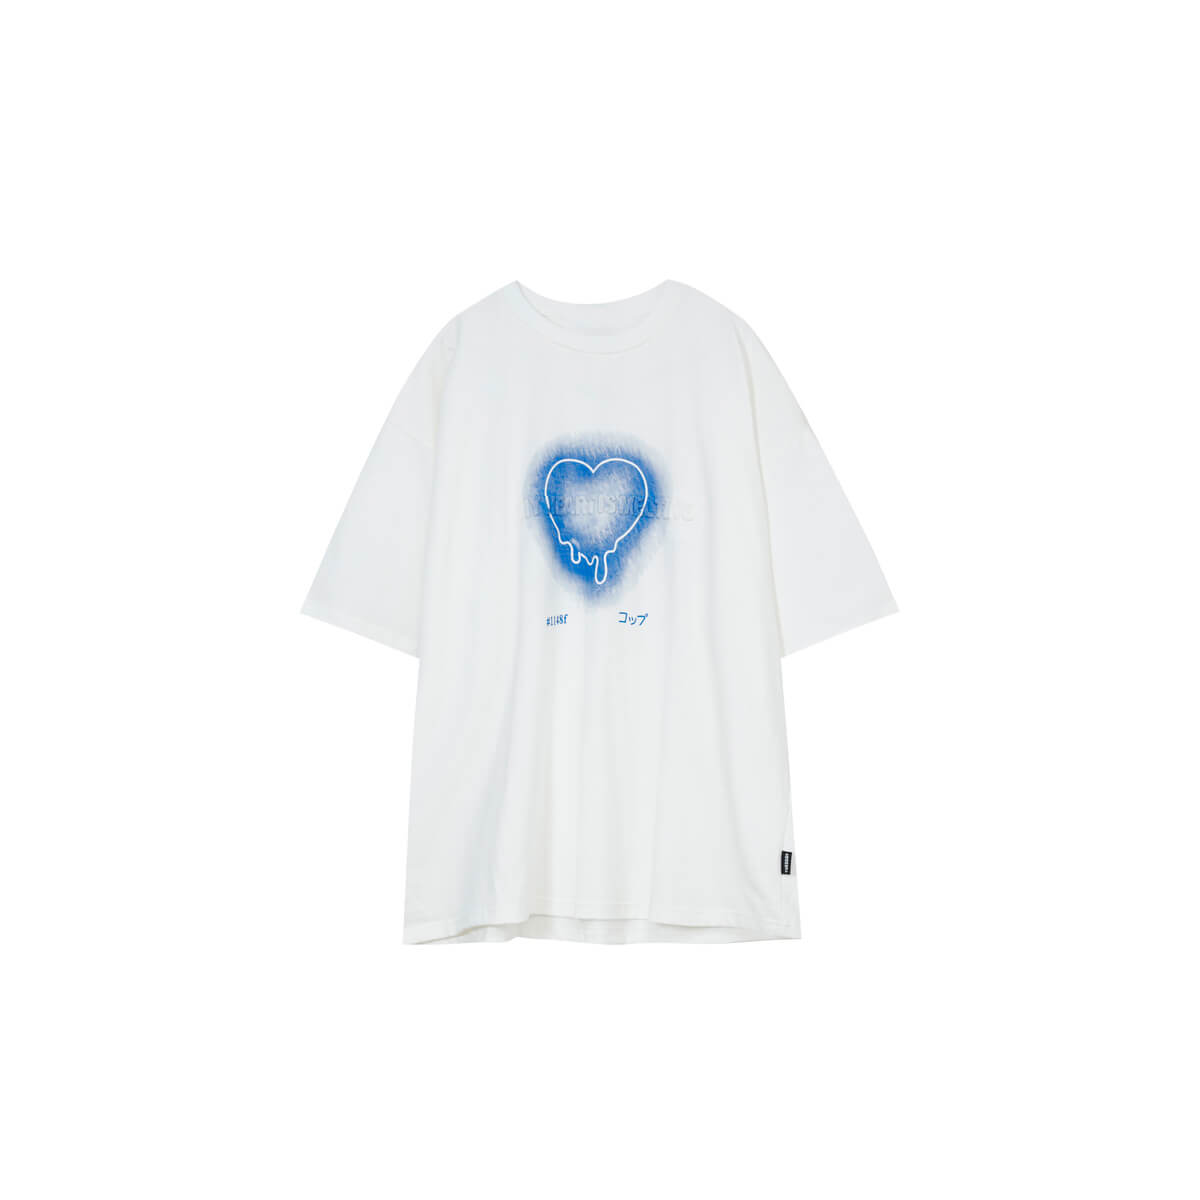 Футболка Cui Layout Studio T-shirt Neon Heart Print White